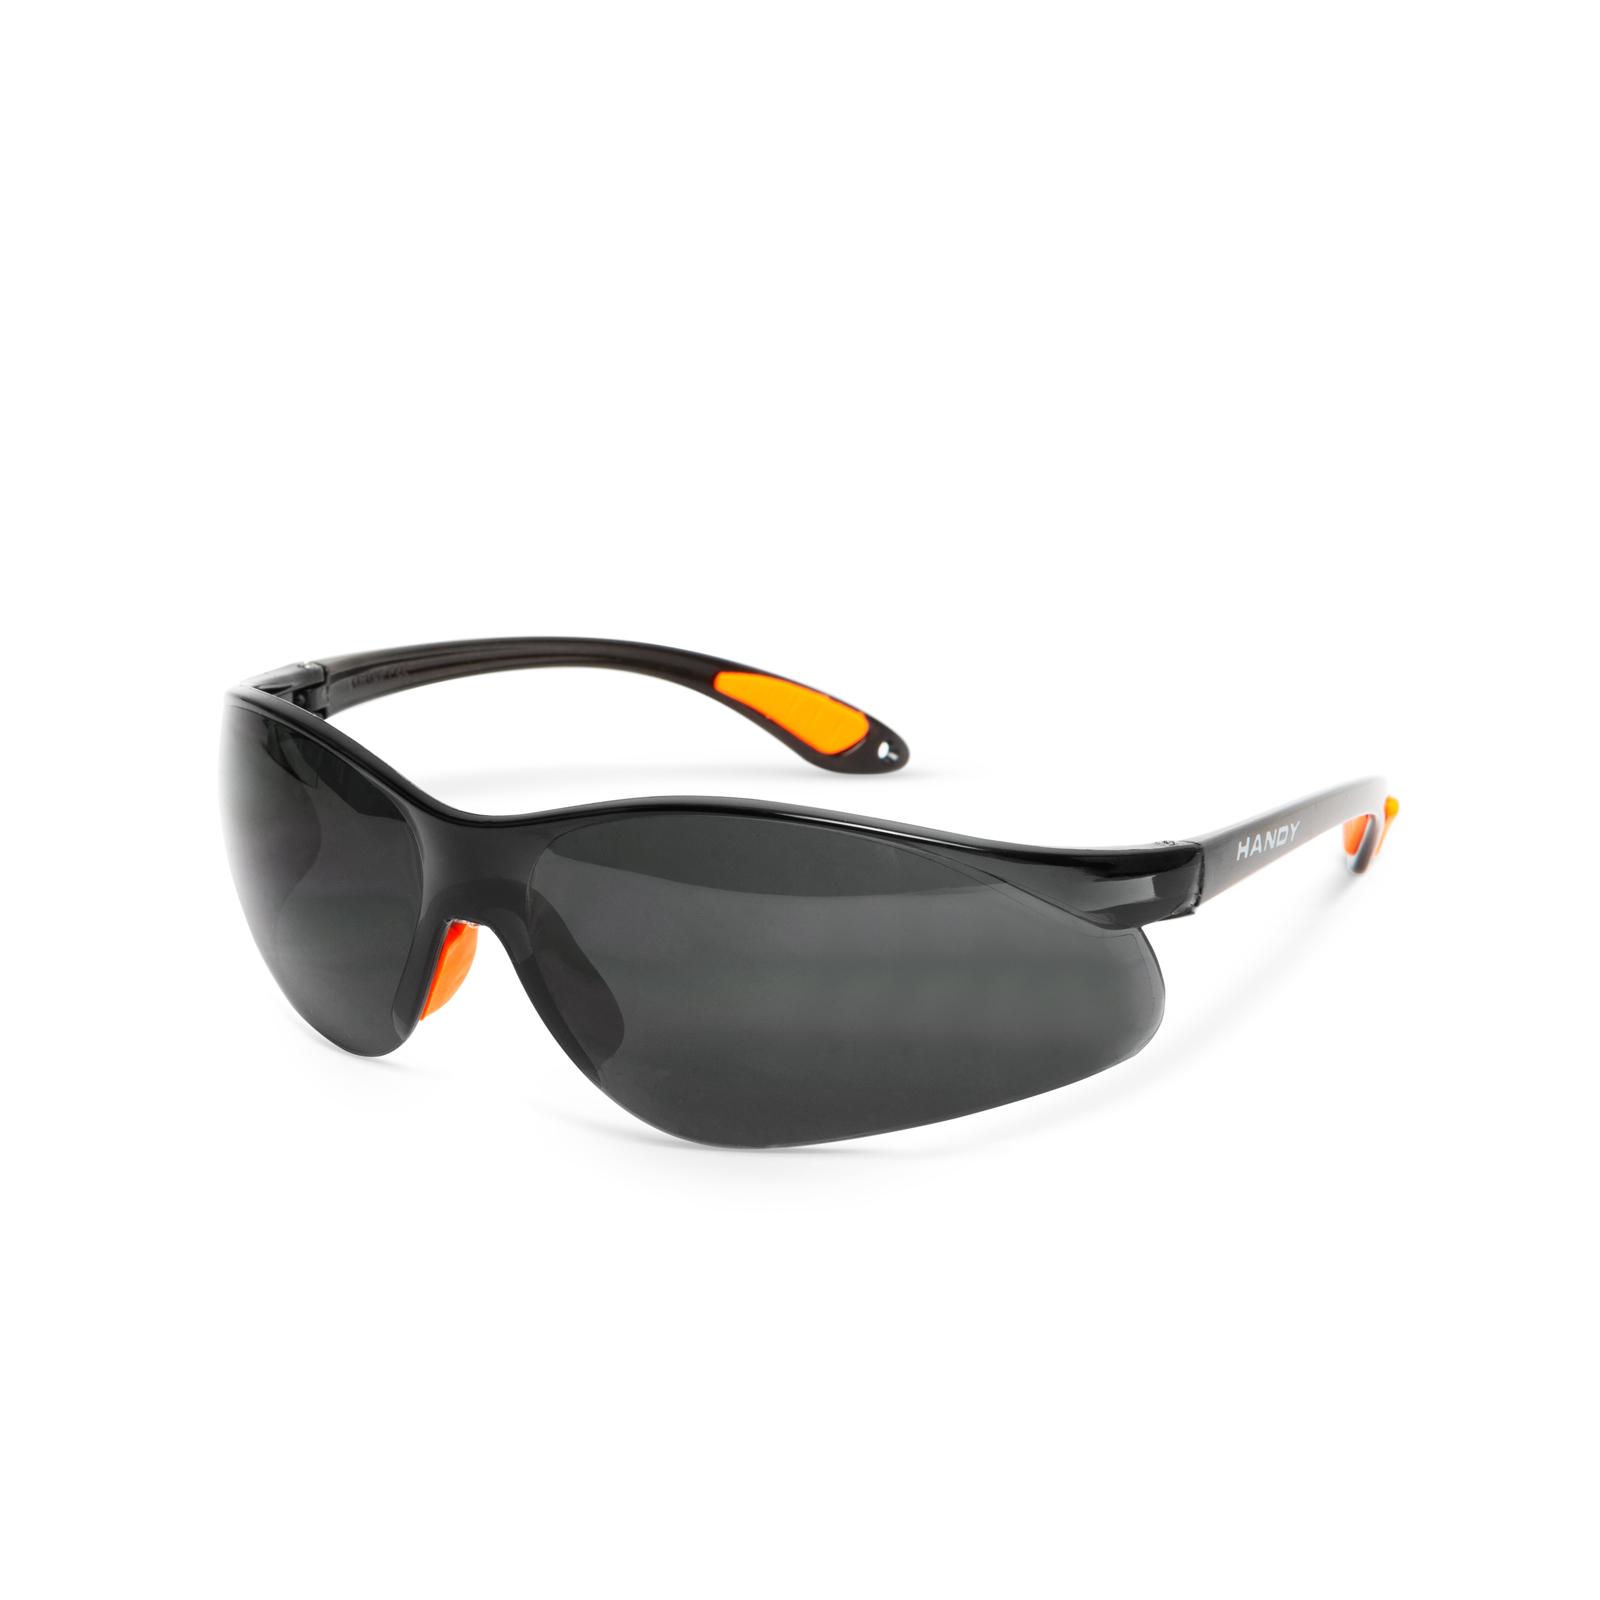 Ochelari de protectie profesionali, cu protectie UV, Gri / Fumuriu